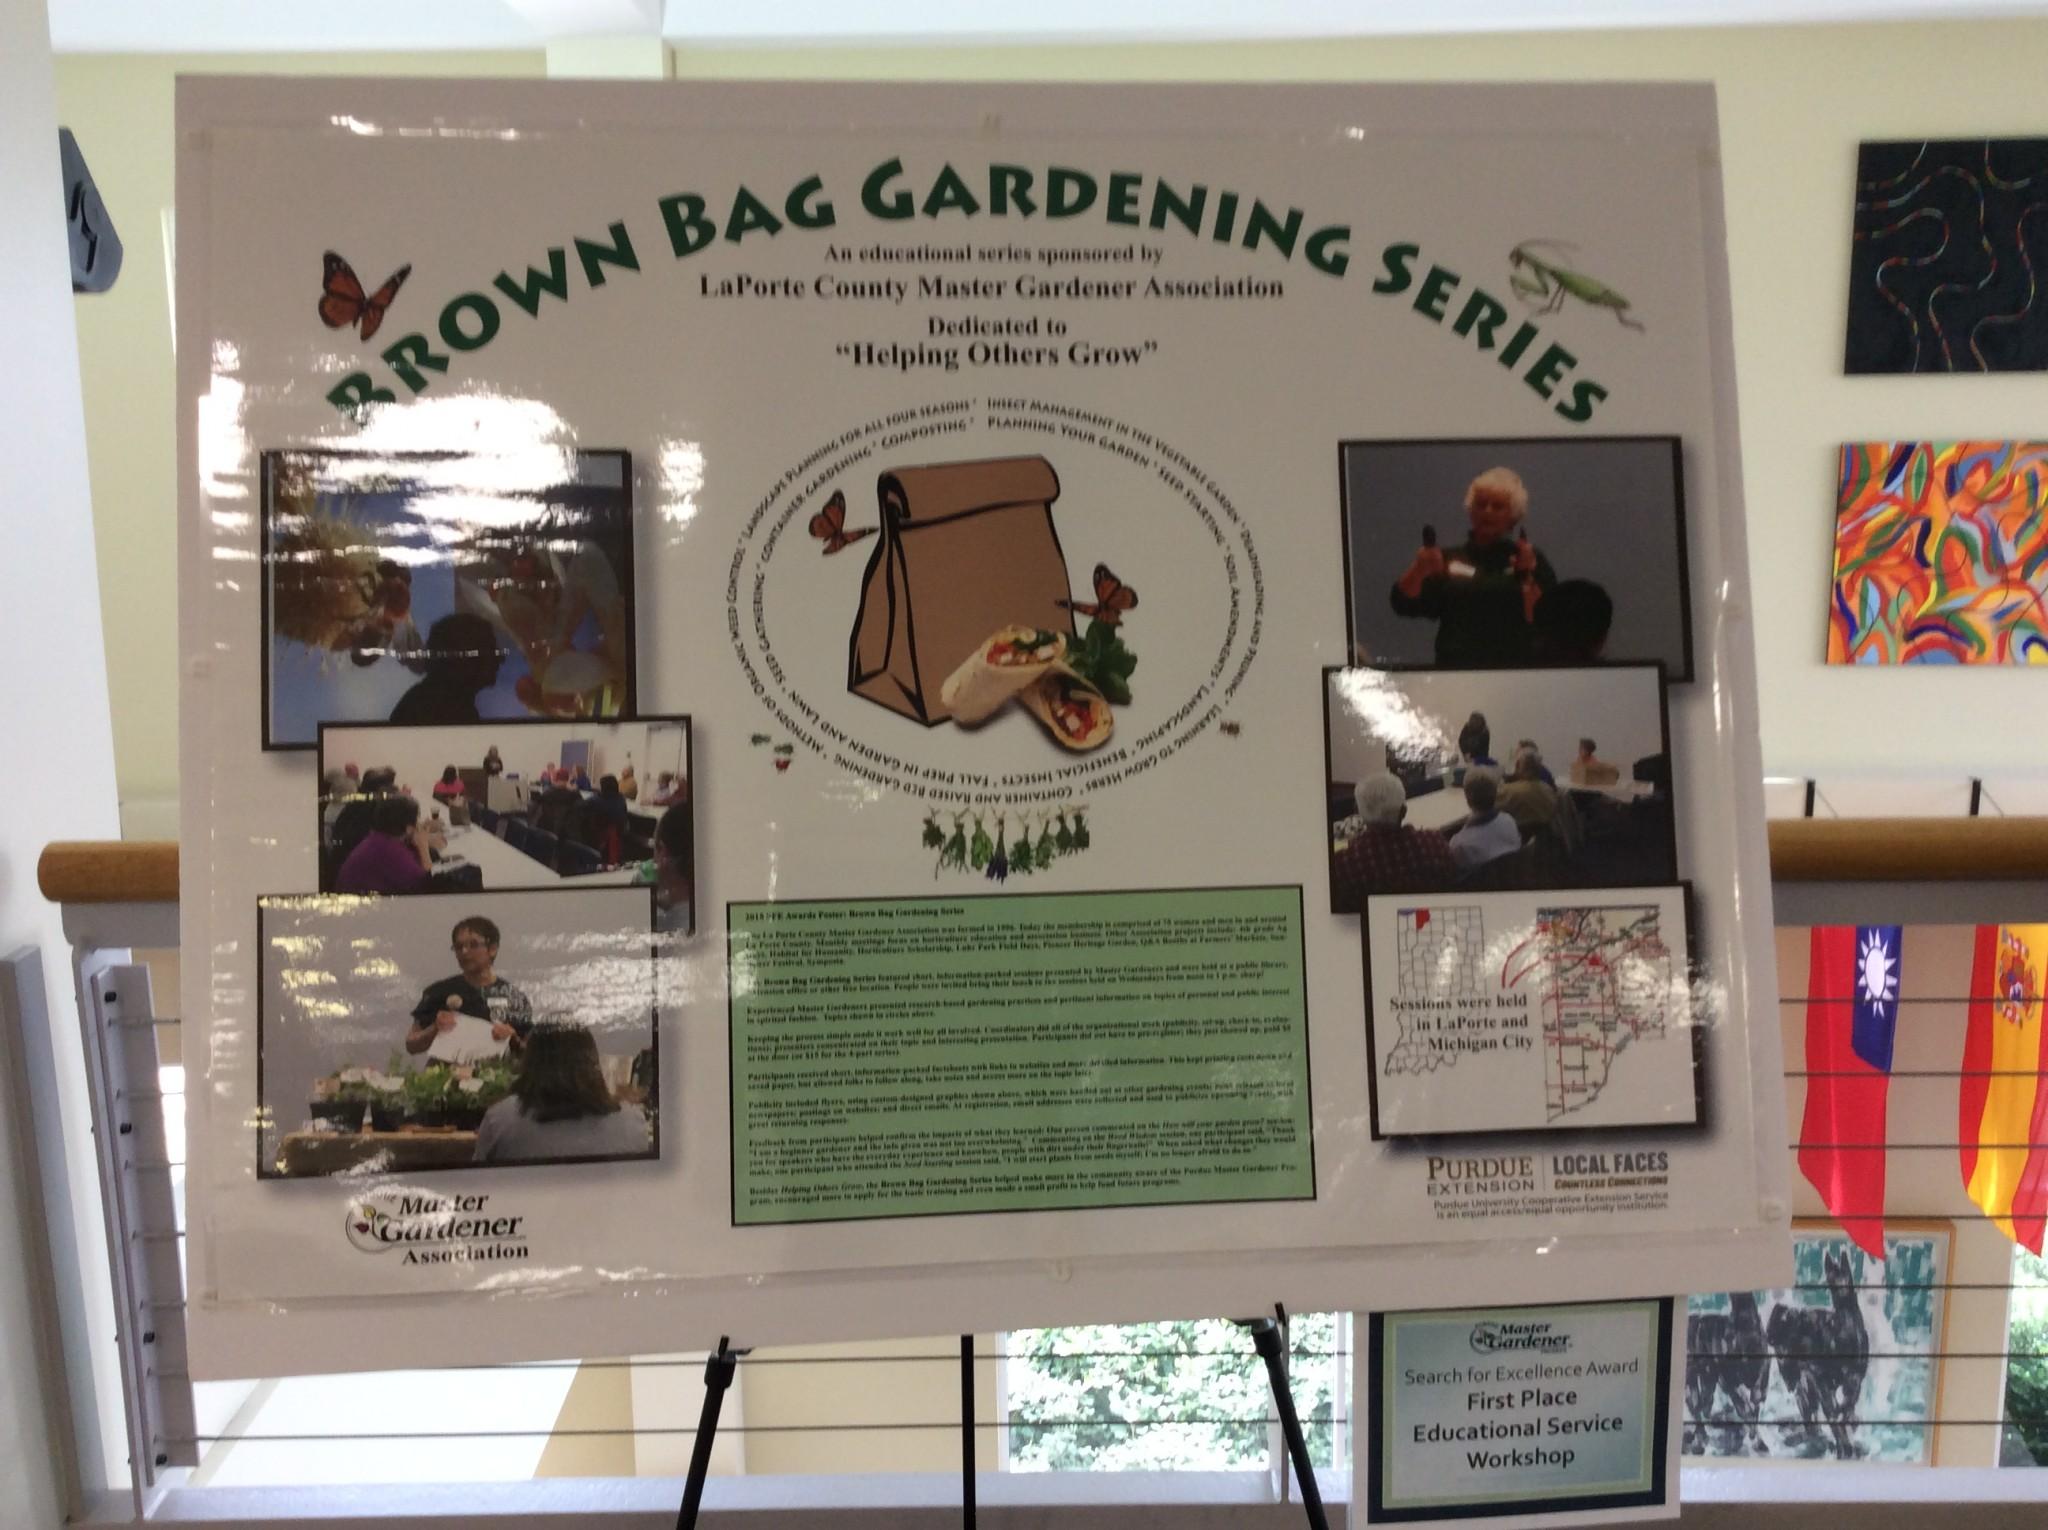 LaPorte County Brown Bag Gardening Series Display